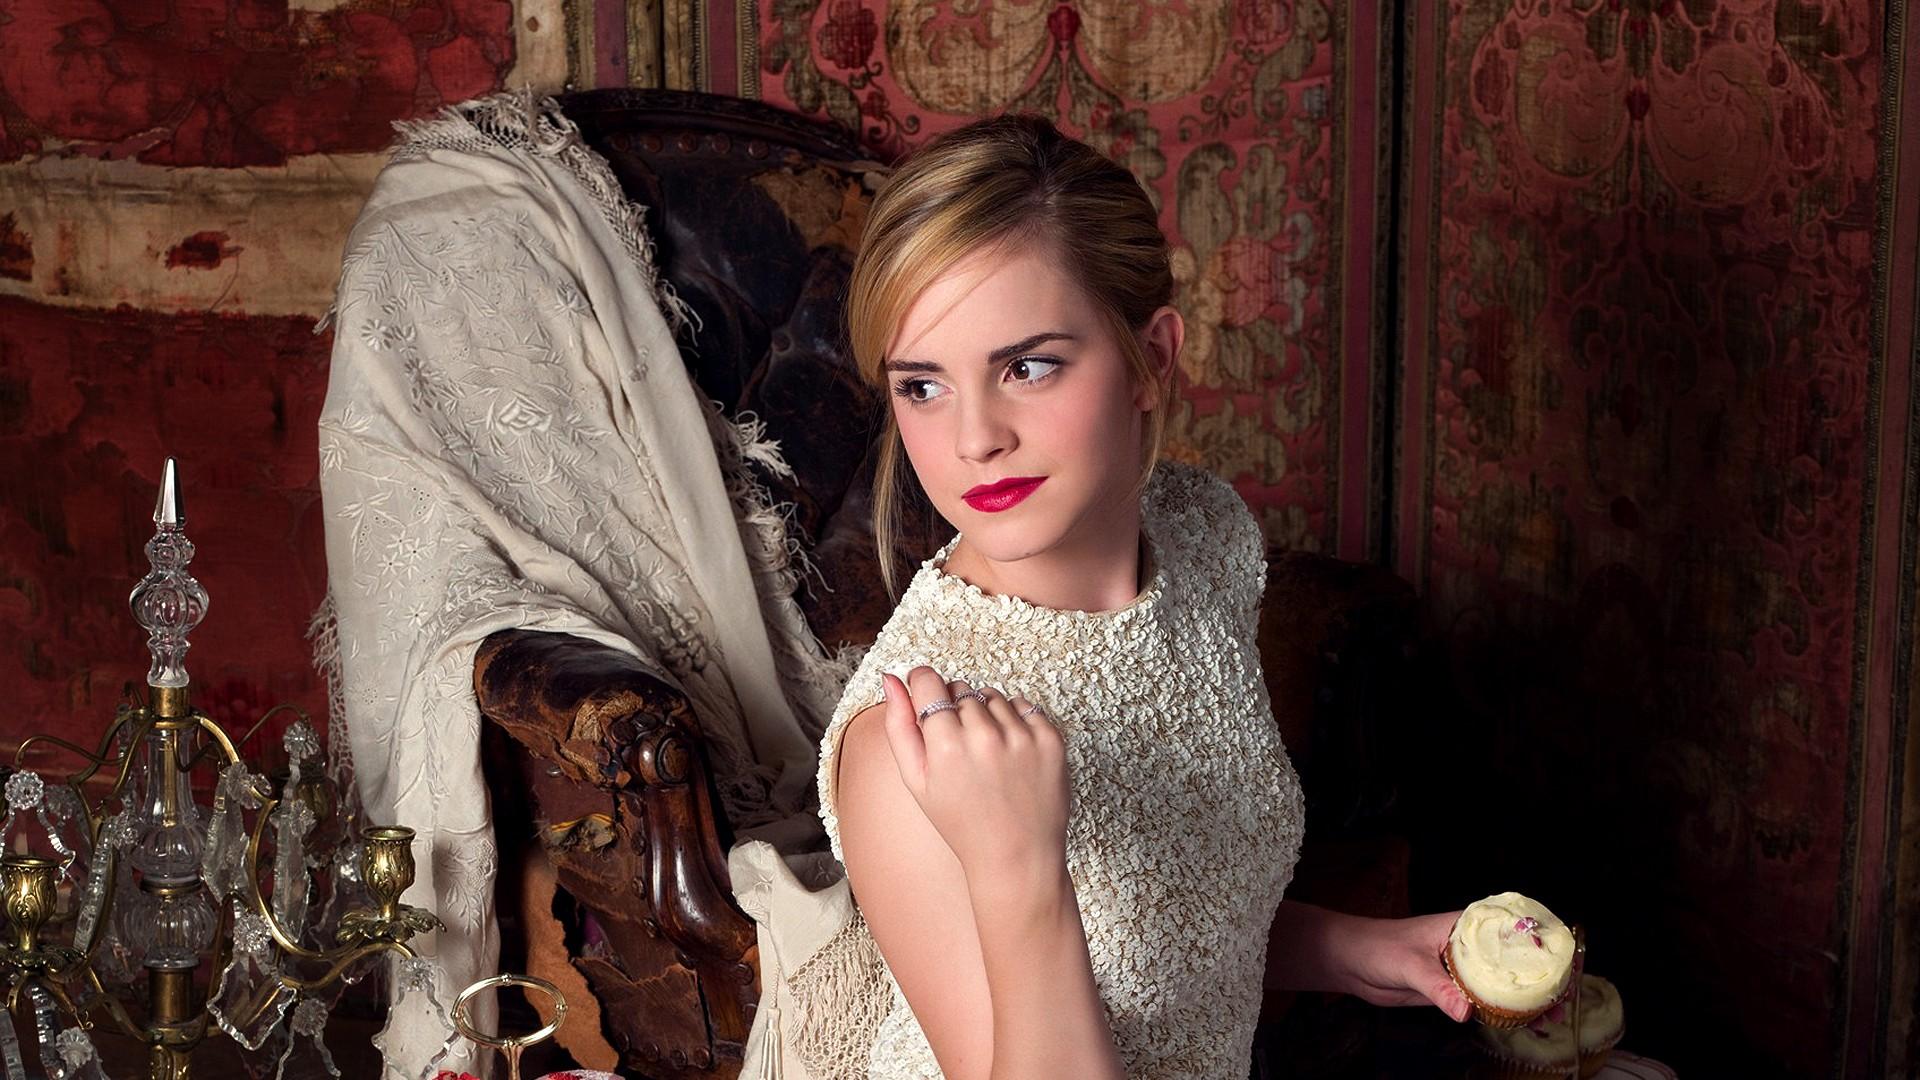 Emma Watson 2013 Beautiful Lady wallpaper | celebrities | Wallpaper ...